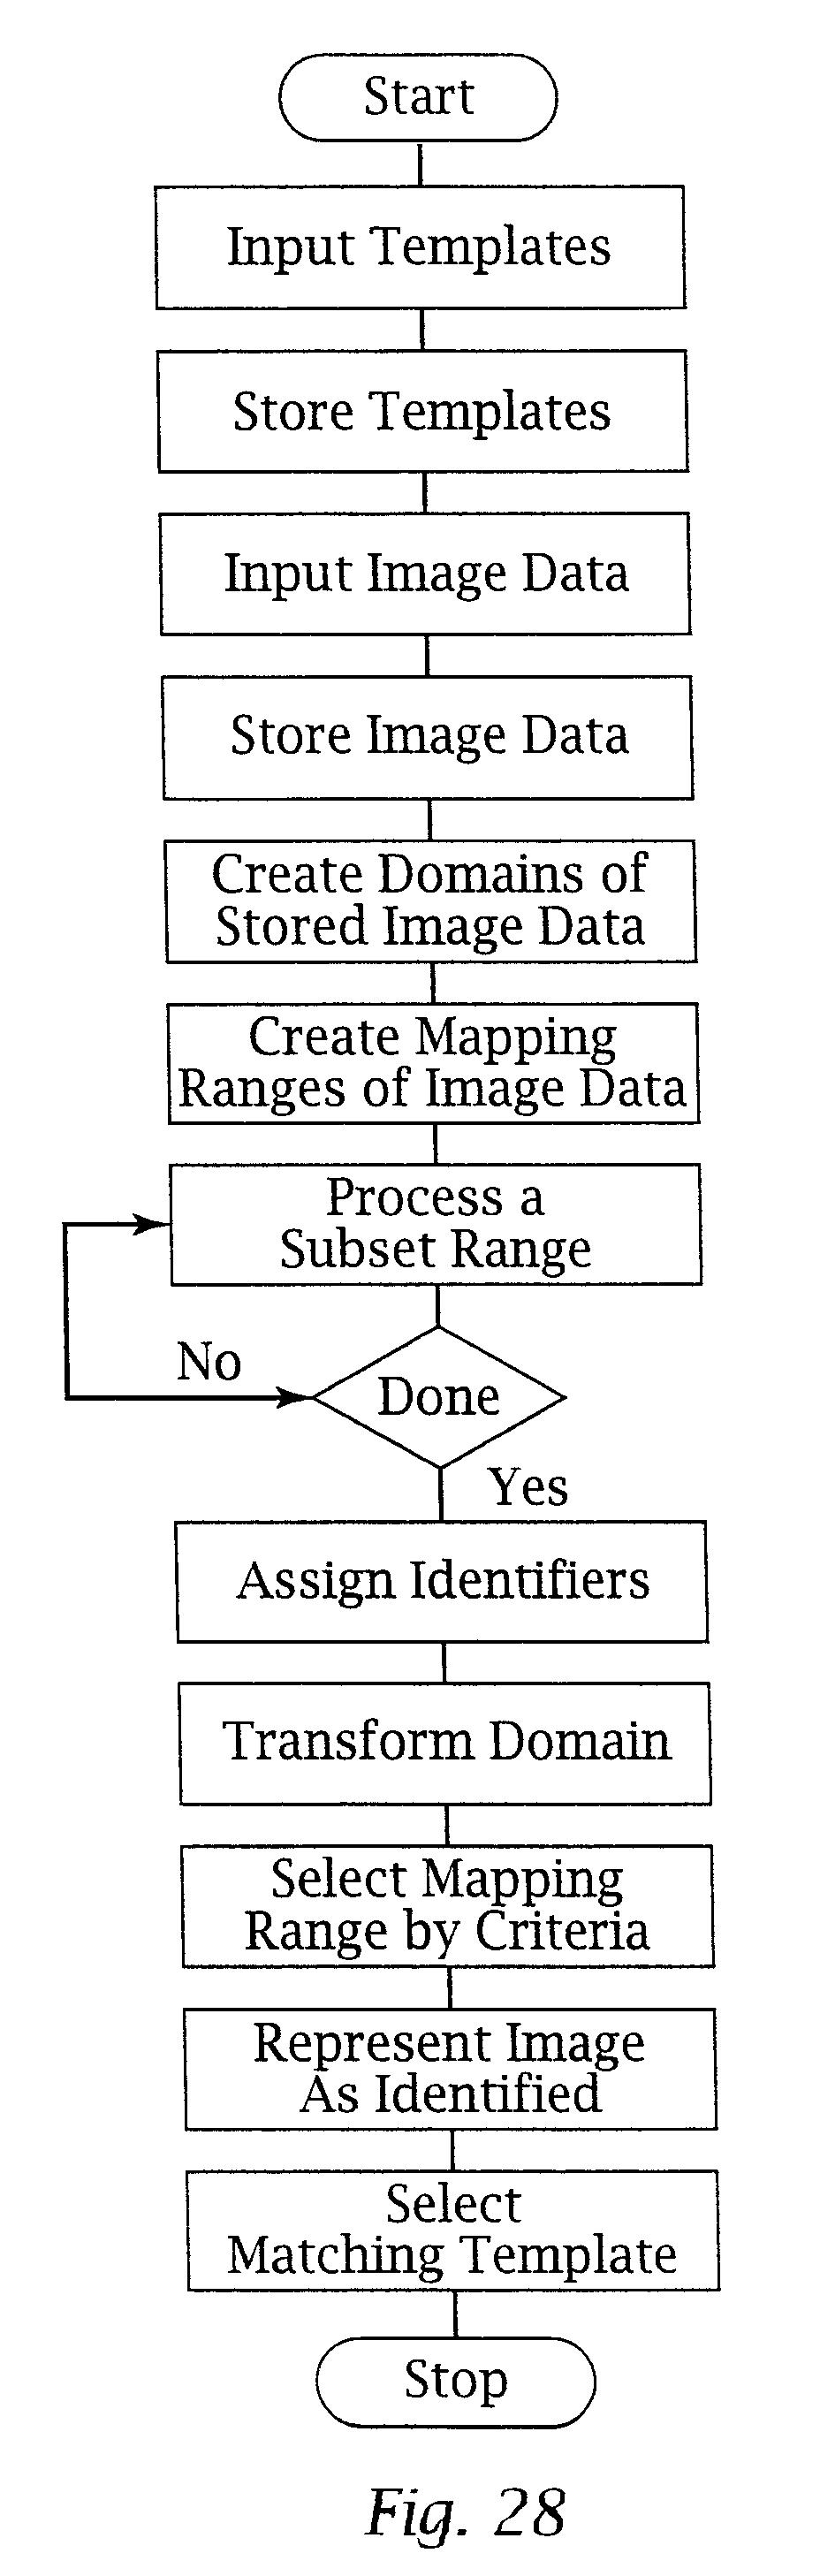 Patent US 8,046,313 B2